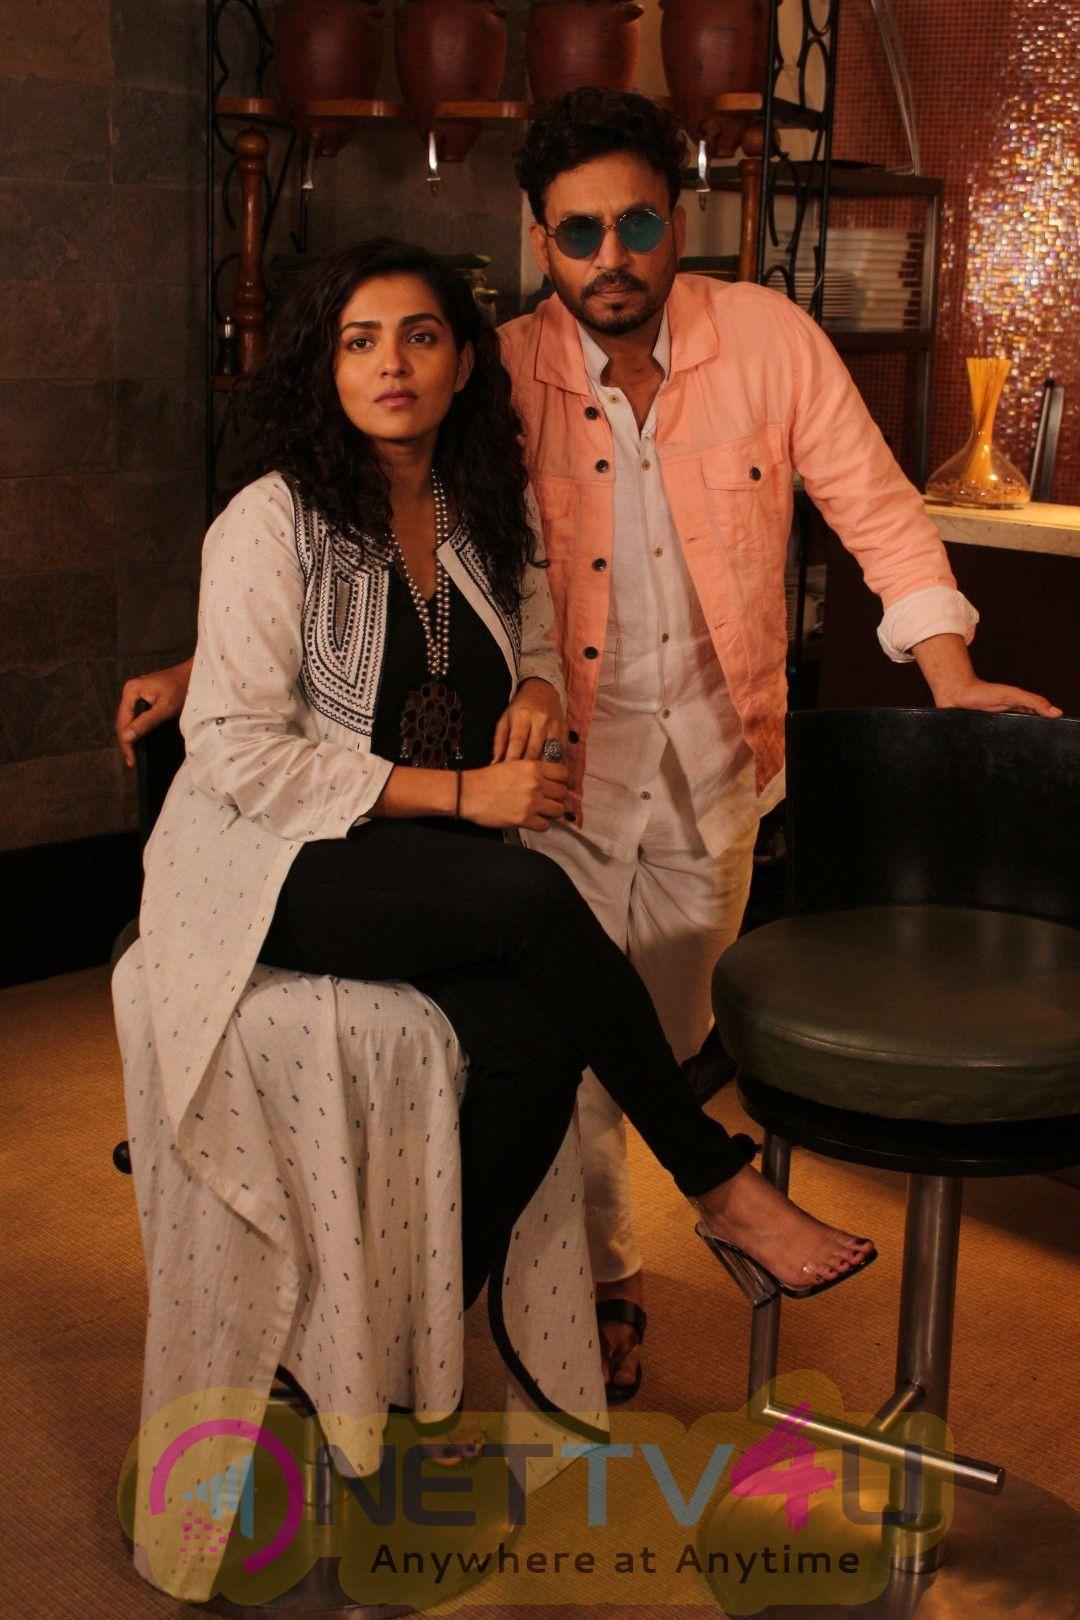 Interview Of Irrfan Khan For The Film Qarib Qarib Singlle Photos